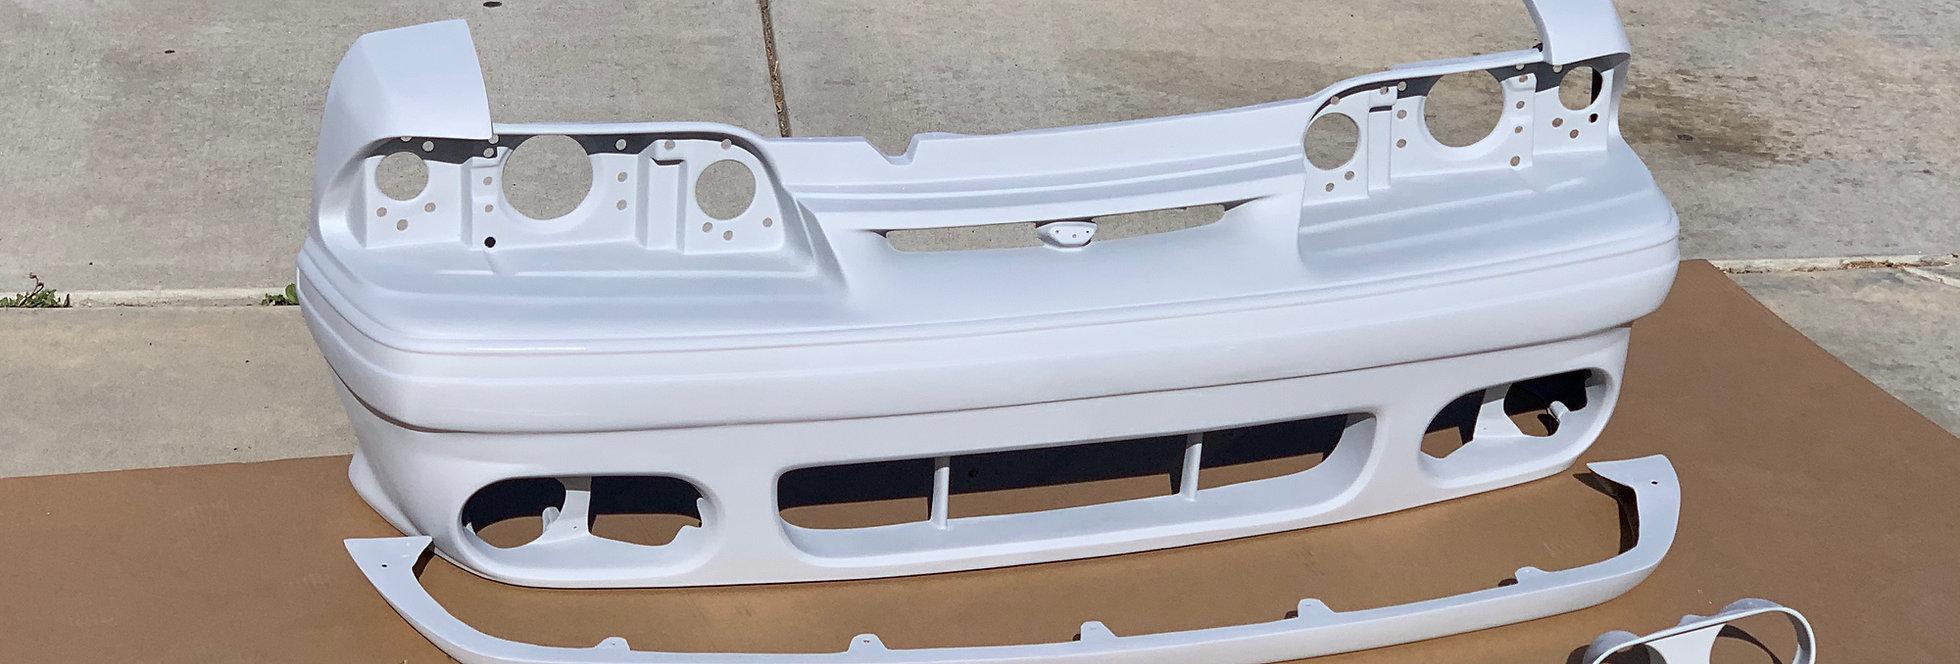 Mustang Terminator Front Bumper